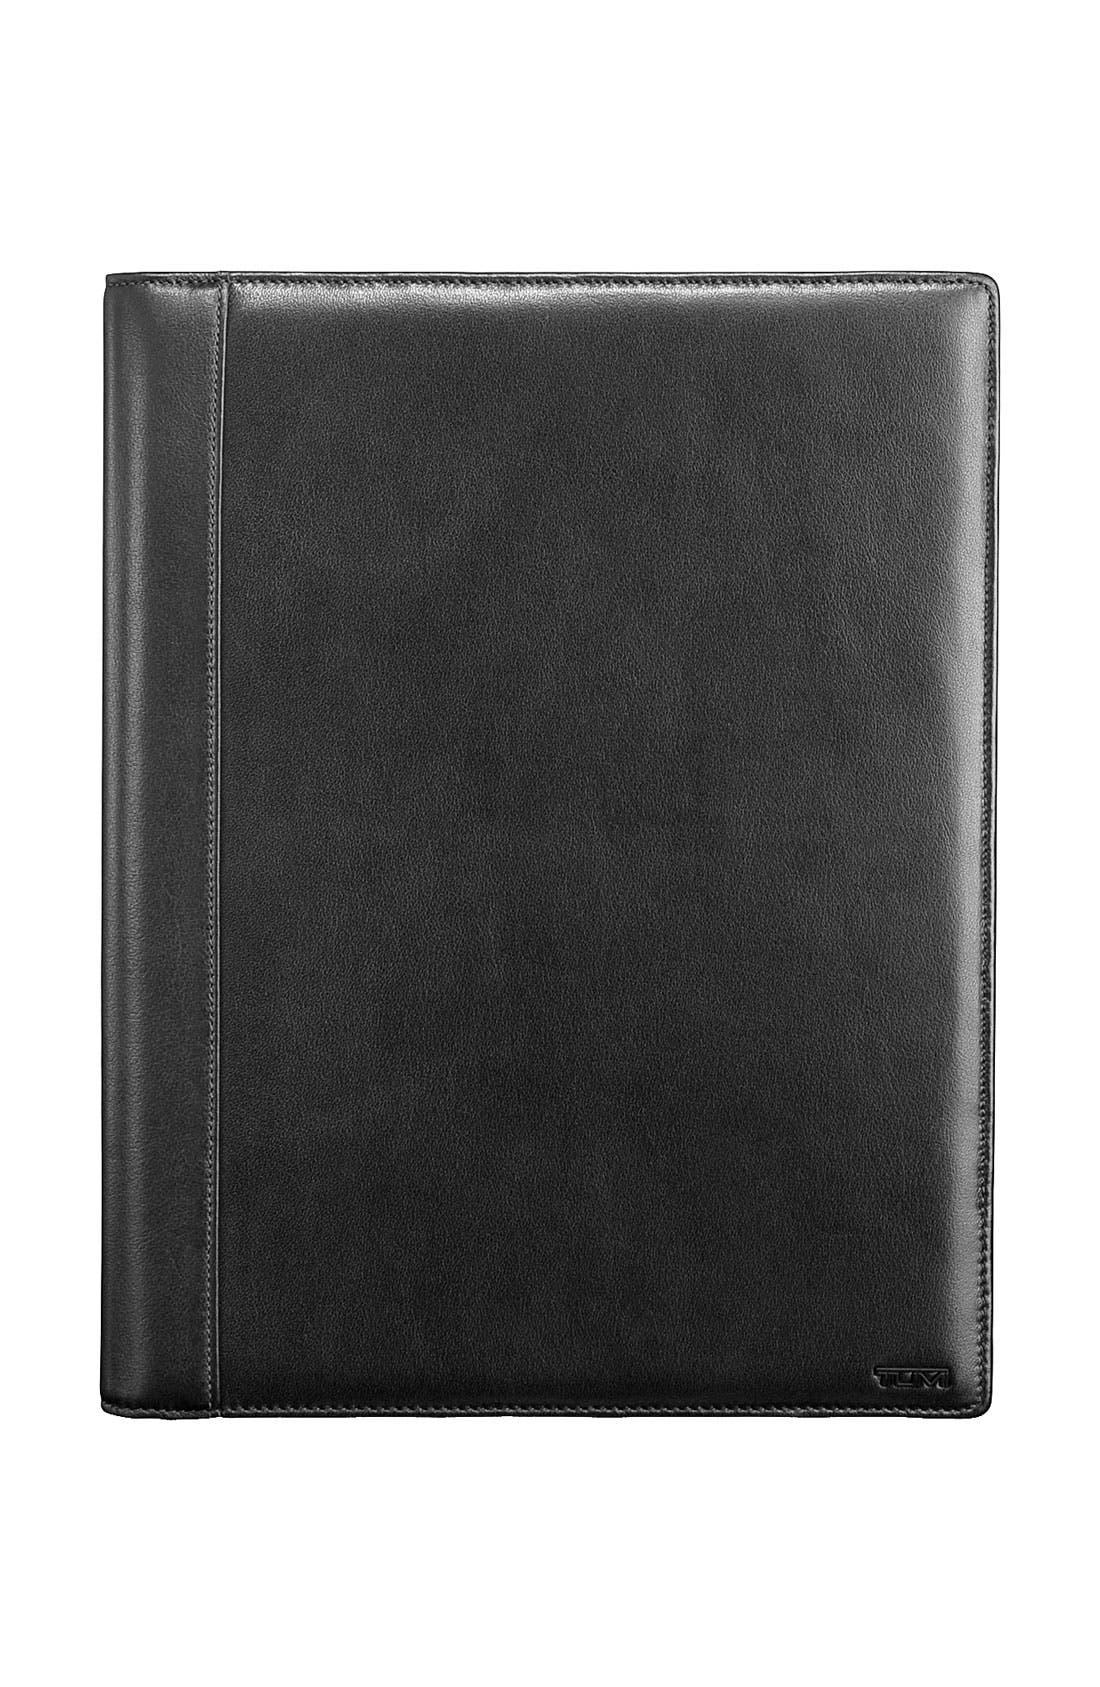 Main Image - Tumi 'Delta' Leather Letterpad